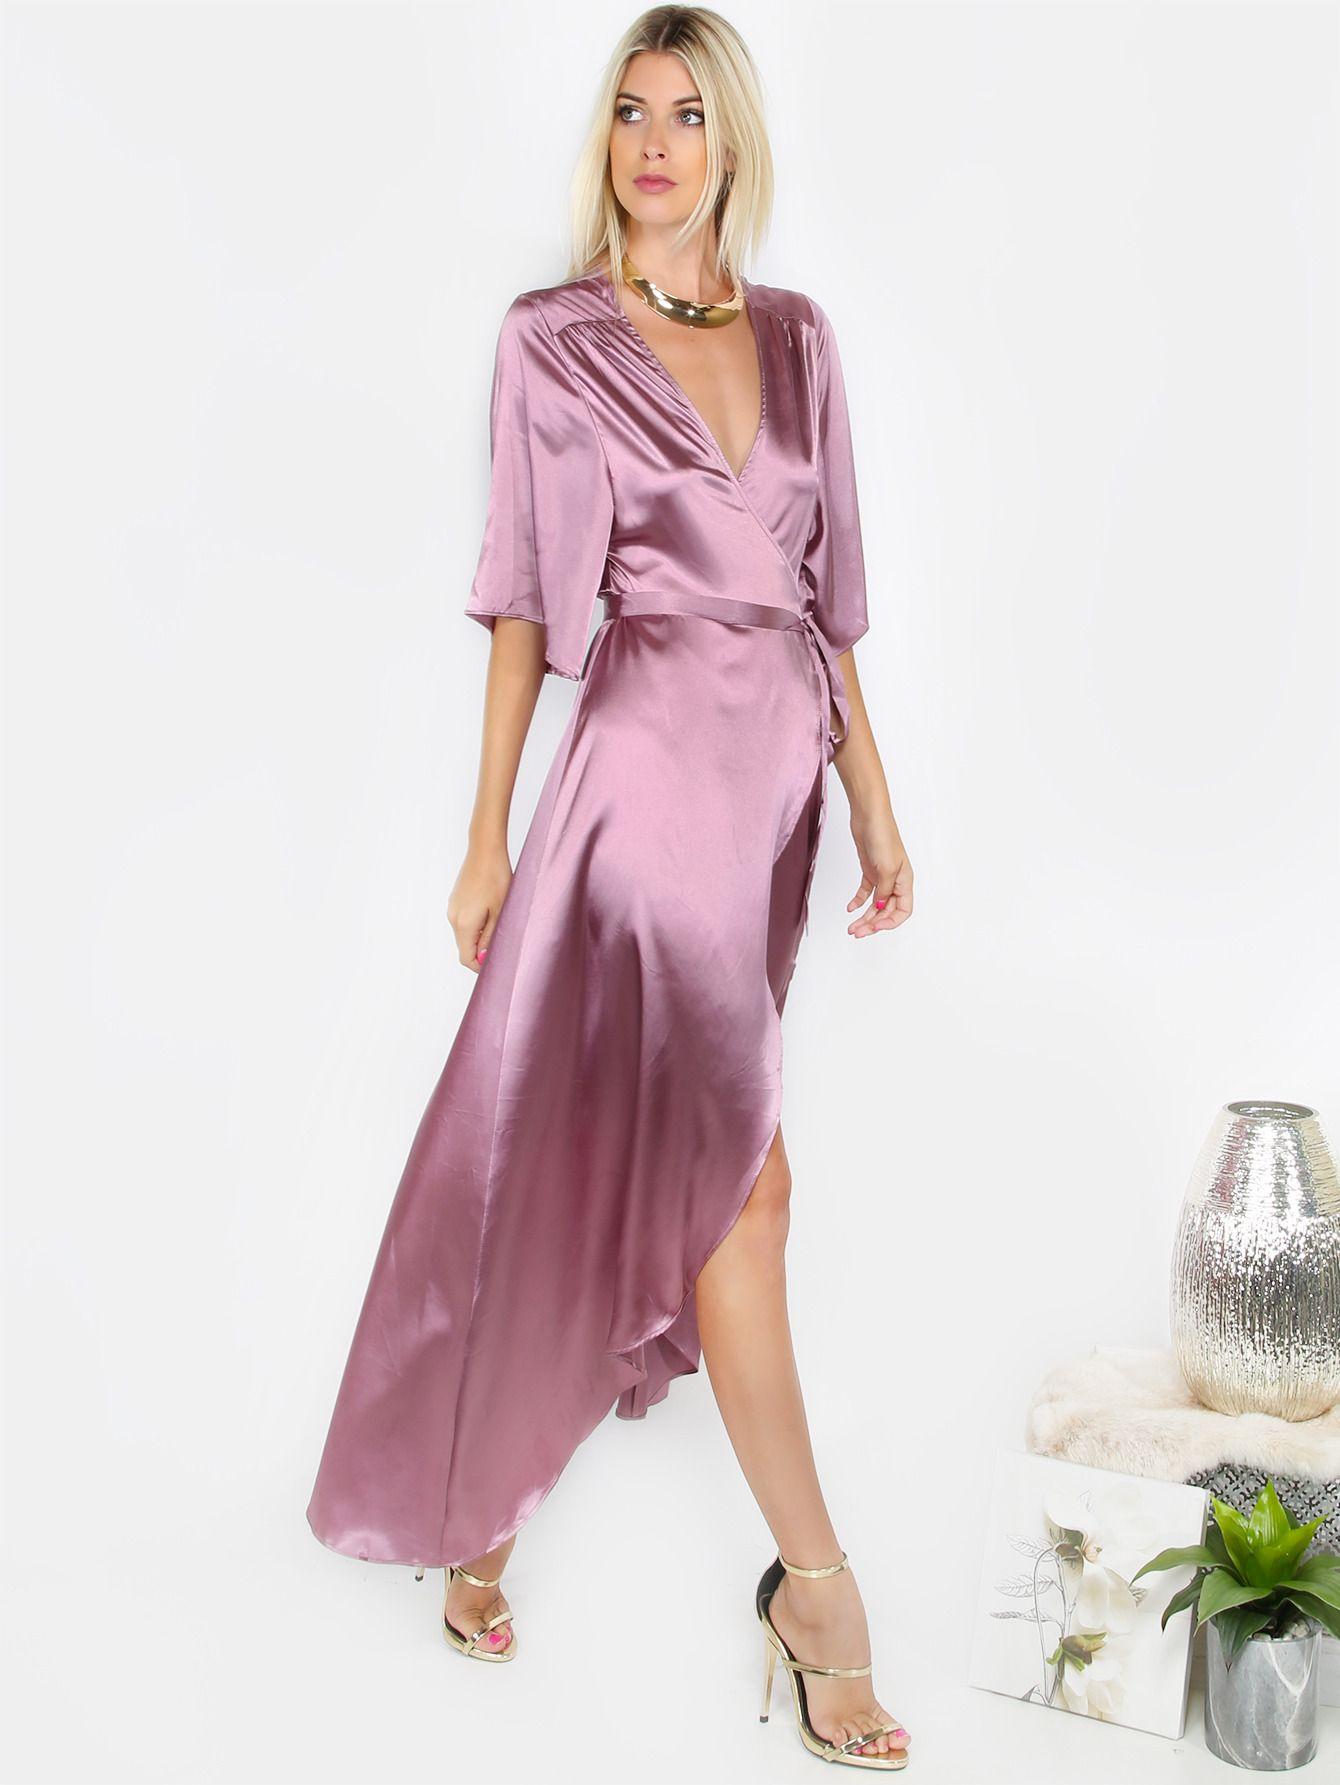 Satin Silky Wrap Dress MAUVE | MakeMeChic.COM | Pinterest